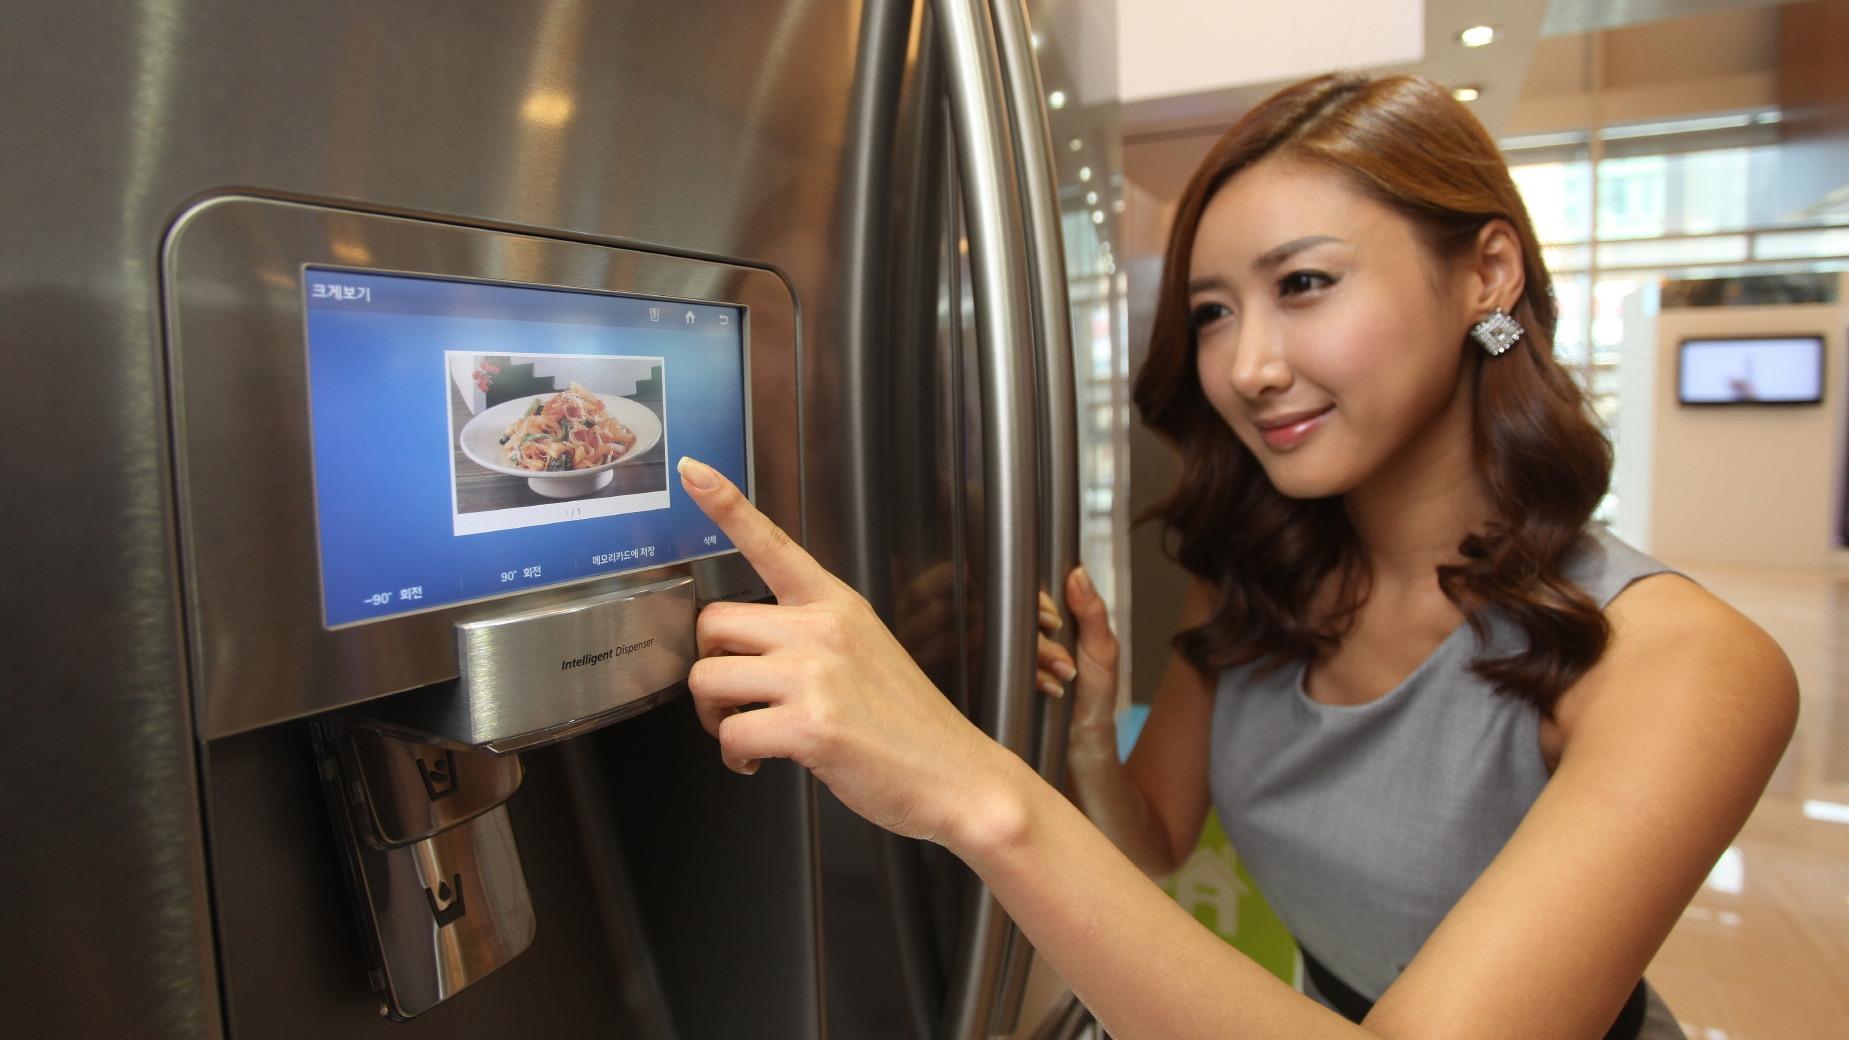 samsung fridge 2